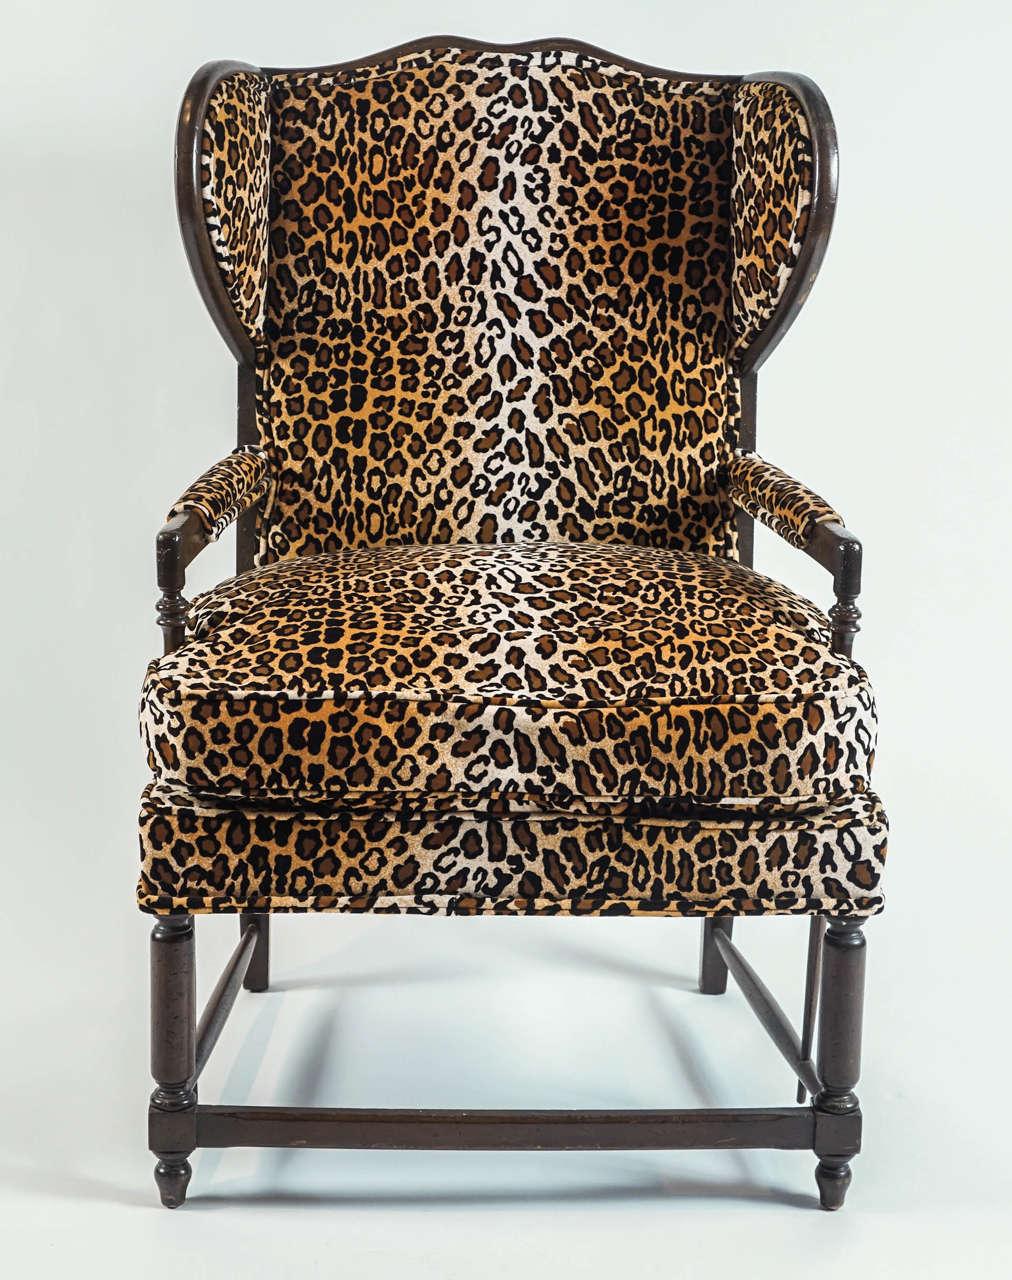 Leopard Print Wingback Chair 2  sc 1 st  1stDibs & Leopard Print Wingback Chair at 1stdibs islam-shia.org